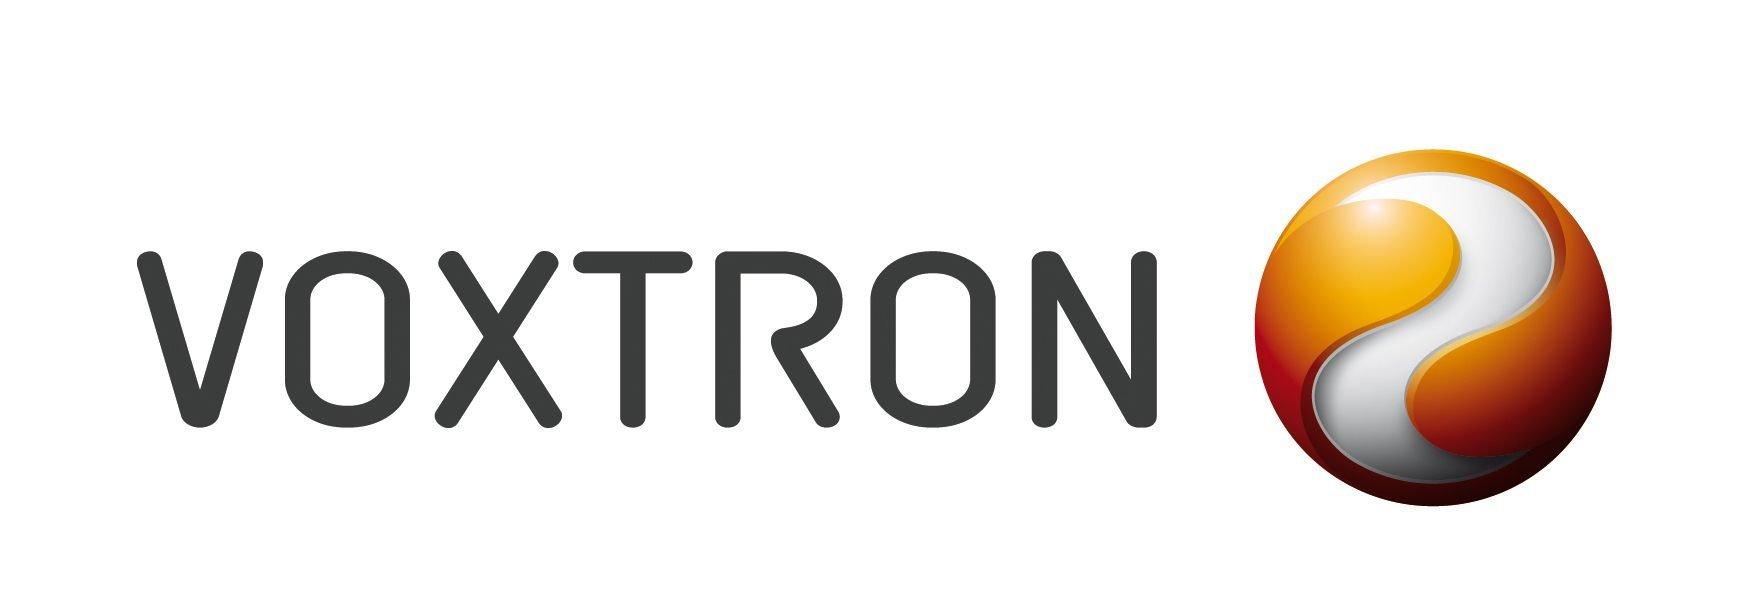 VOXTRON_RGB_POS_LARGE.jpg